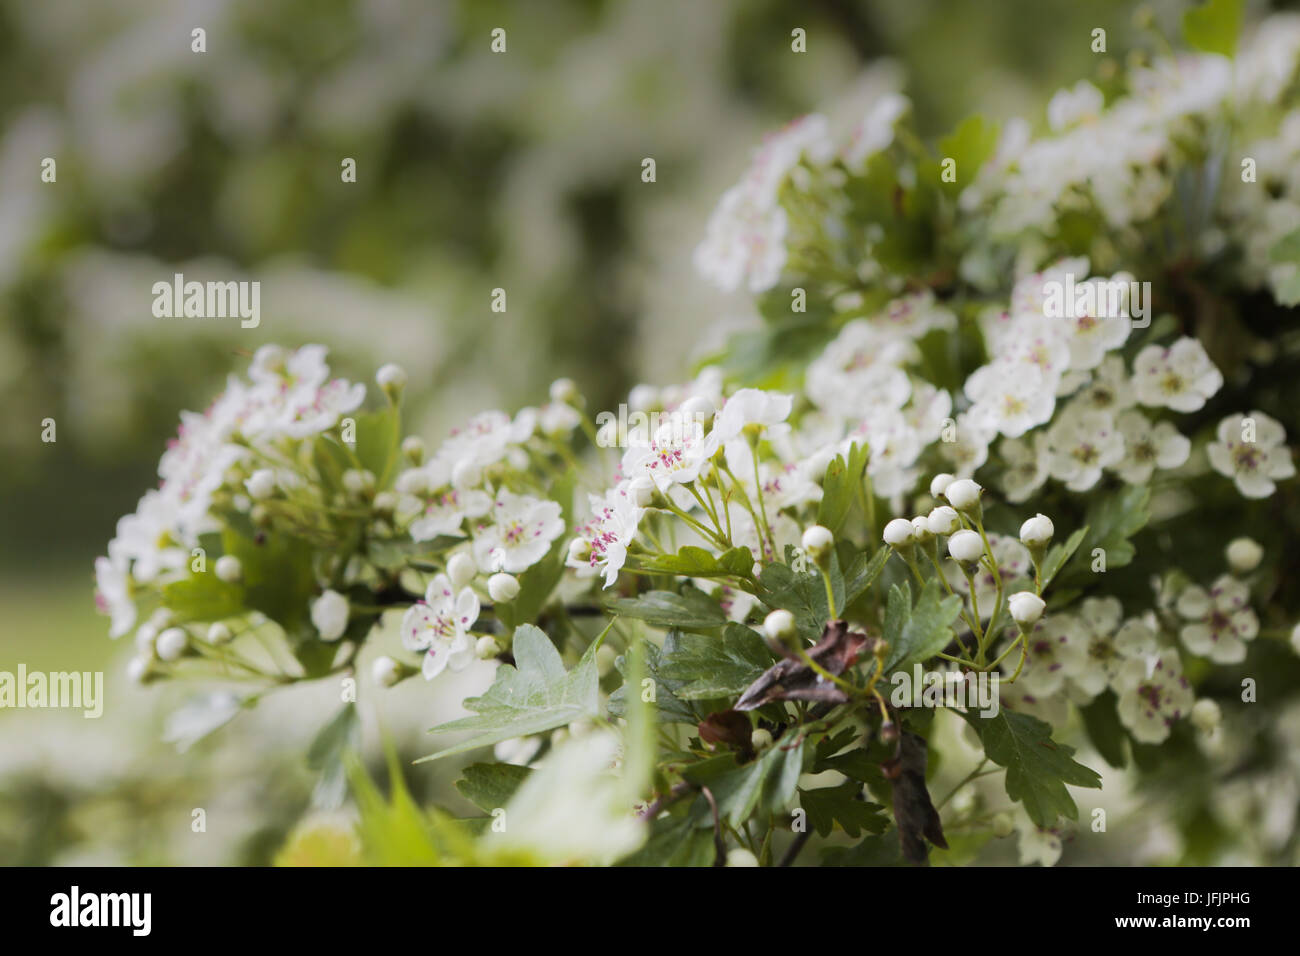 whitethorn, hawthorn abloom Stock Photo